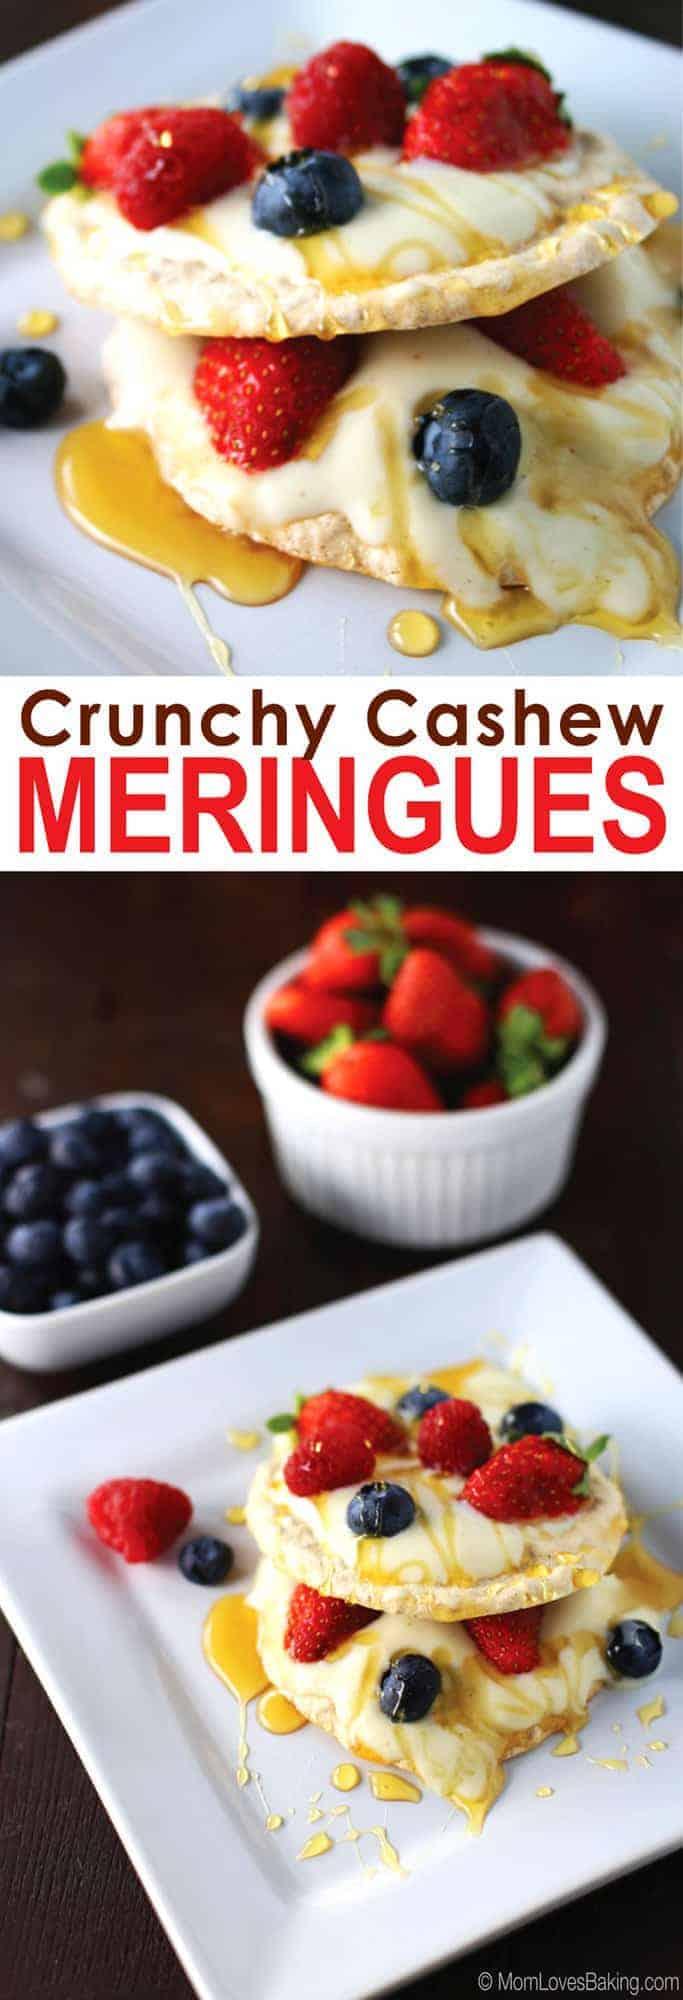 Crunchy Cashew Meringues